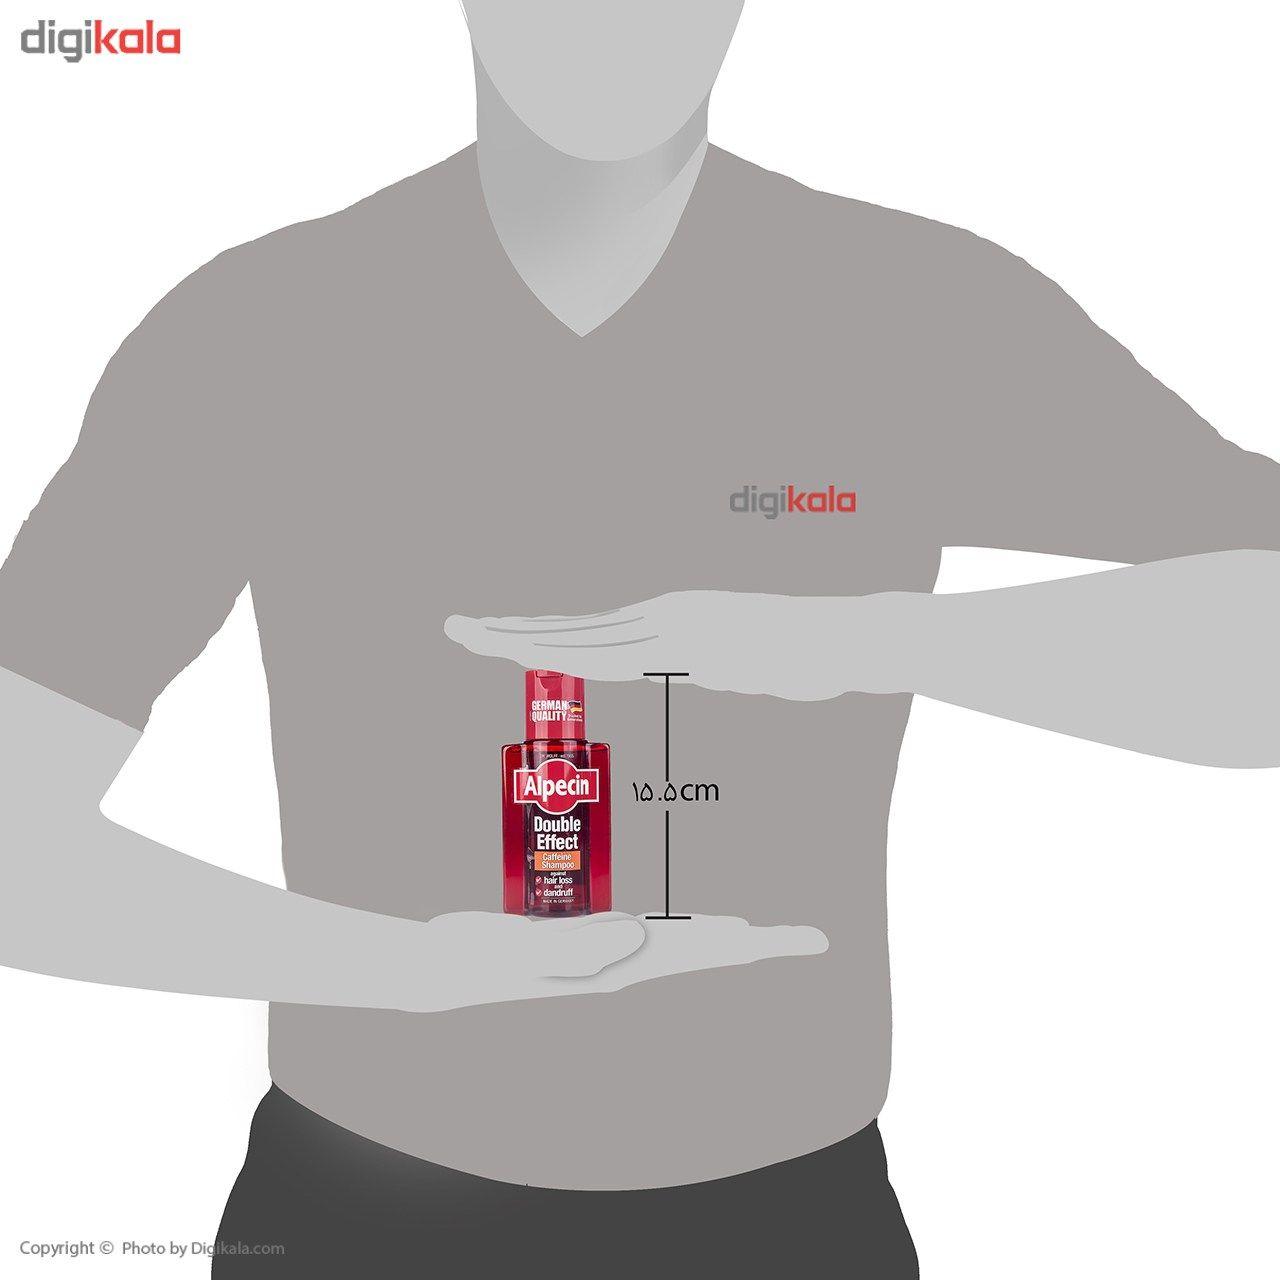 شامپو ضد شوره و تقویت کننده آلپسین مدل Double Effect Caffeine حجم 200 میلی لیتر main 1 3